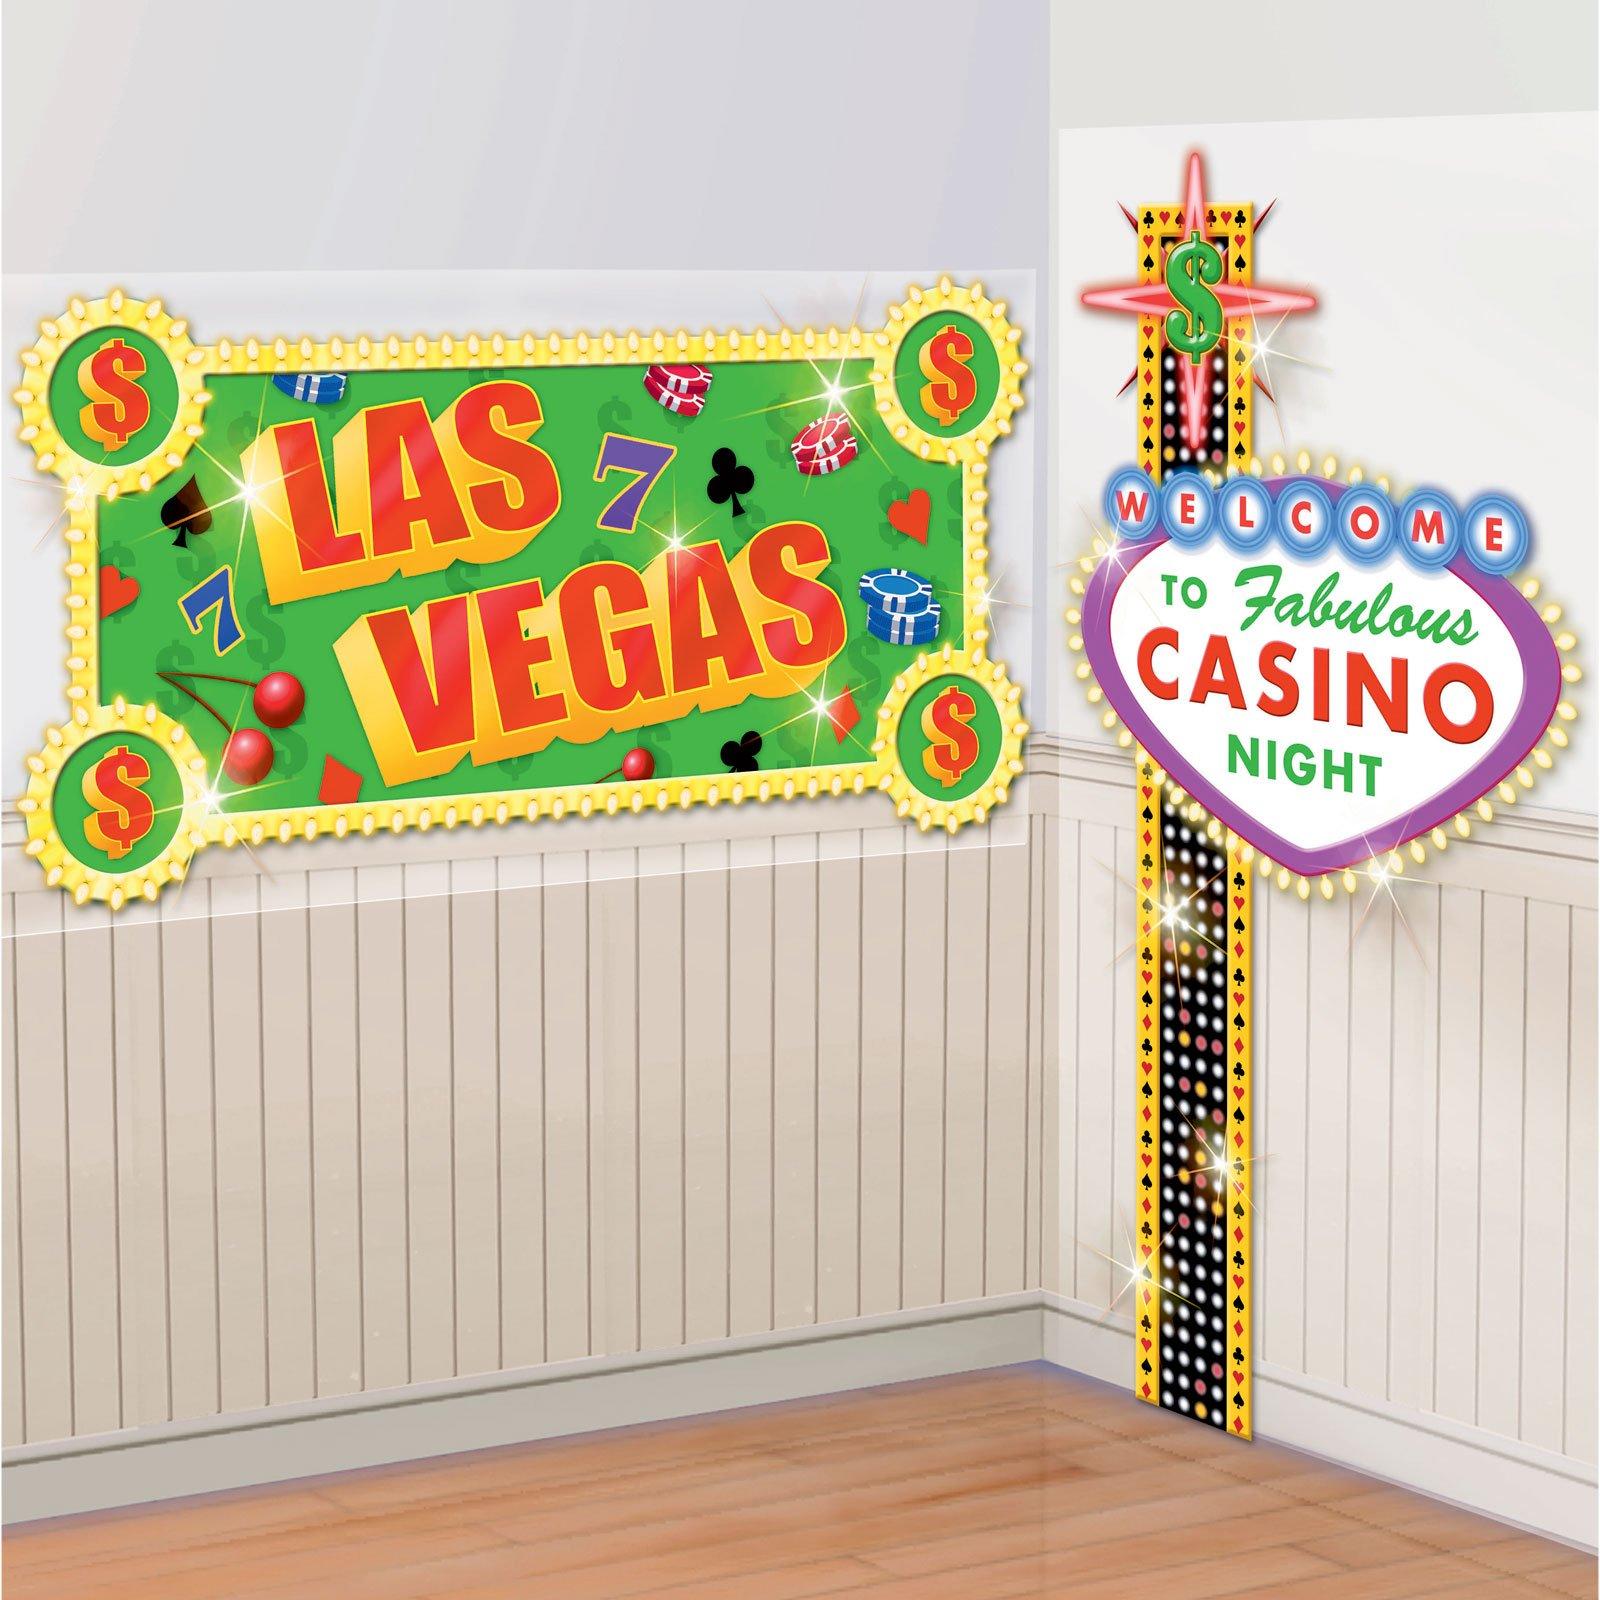 5'-Las-Vegas-Casino-Welcome-decoration